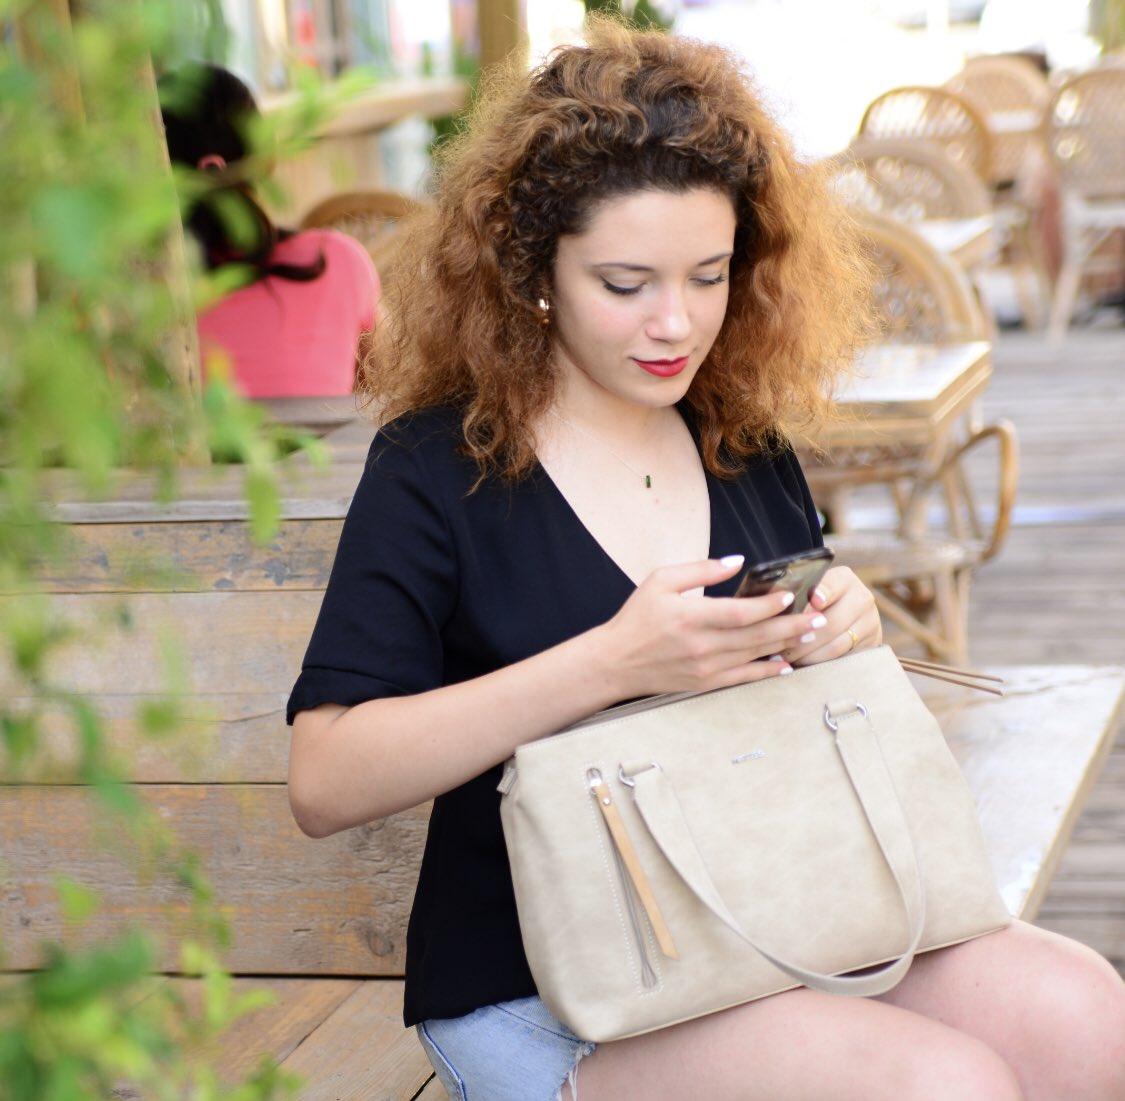 Ideal basic for every summer day _________ Básico ideal para todos los días de verano. #matties #bags #verano #nature #style #stylish #summer #newcollection #classicbag #spain #bolsos #tendencia #trend #moda #regalo #gift #citybags #nuevacolección #matiassalvapic.twitter.com/bvrjY8g9Oe